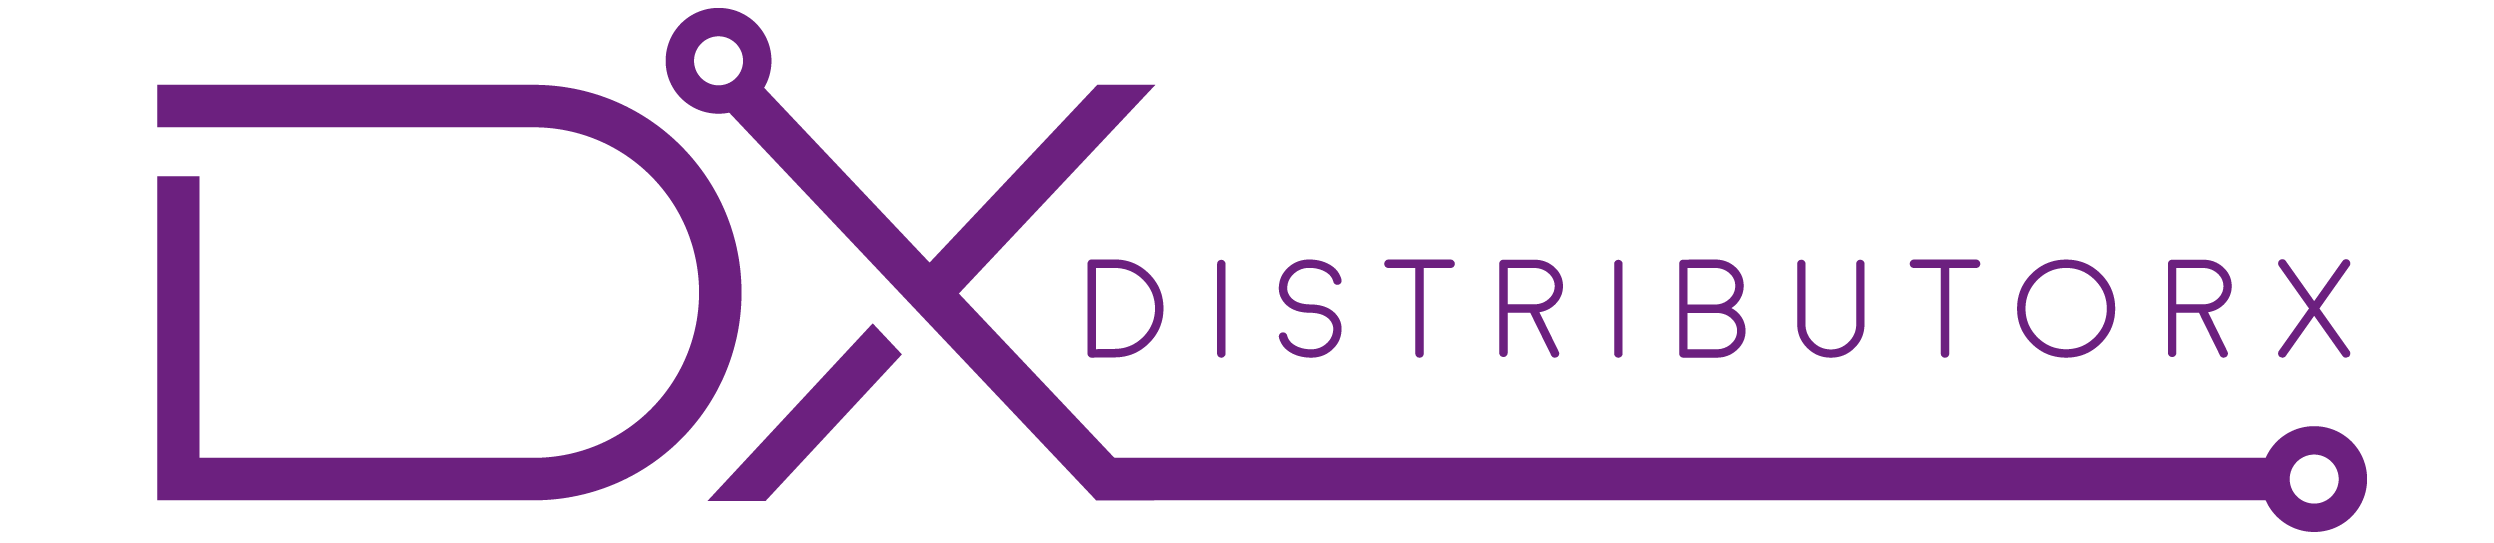 DistributorX Logo